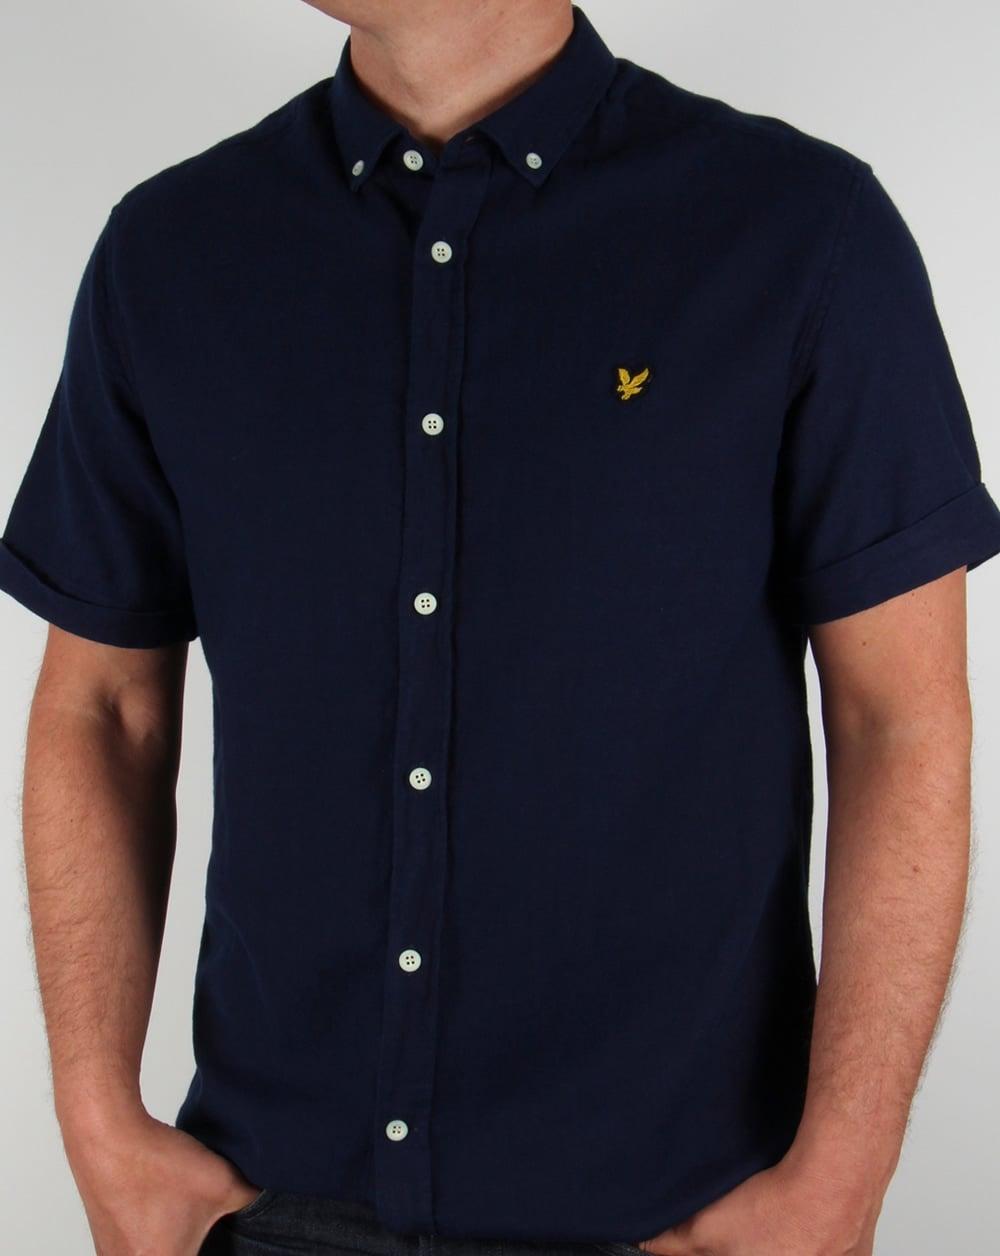 Lyle and scott short sleeve oxford shirt dark indigomens for Lyle and scott shirt sale